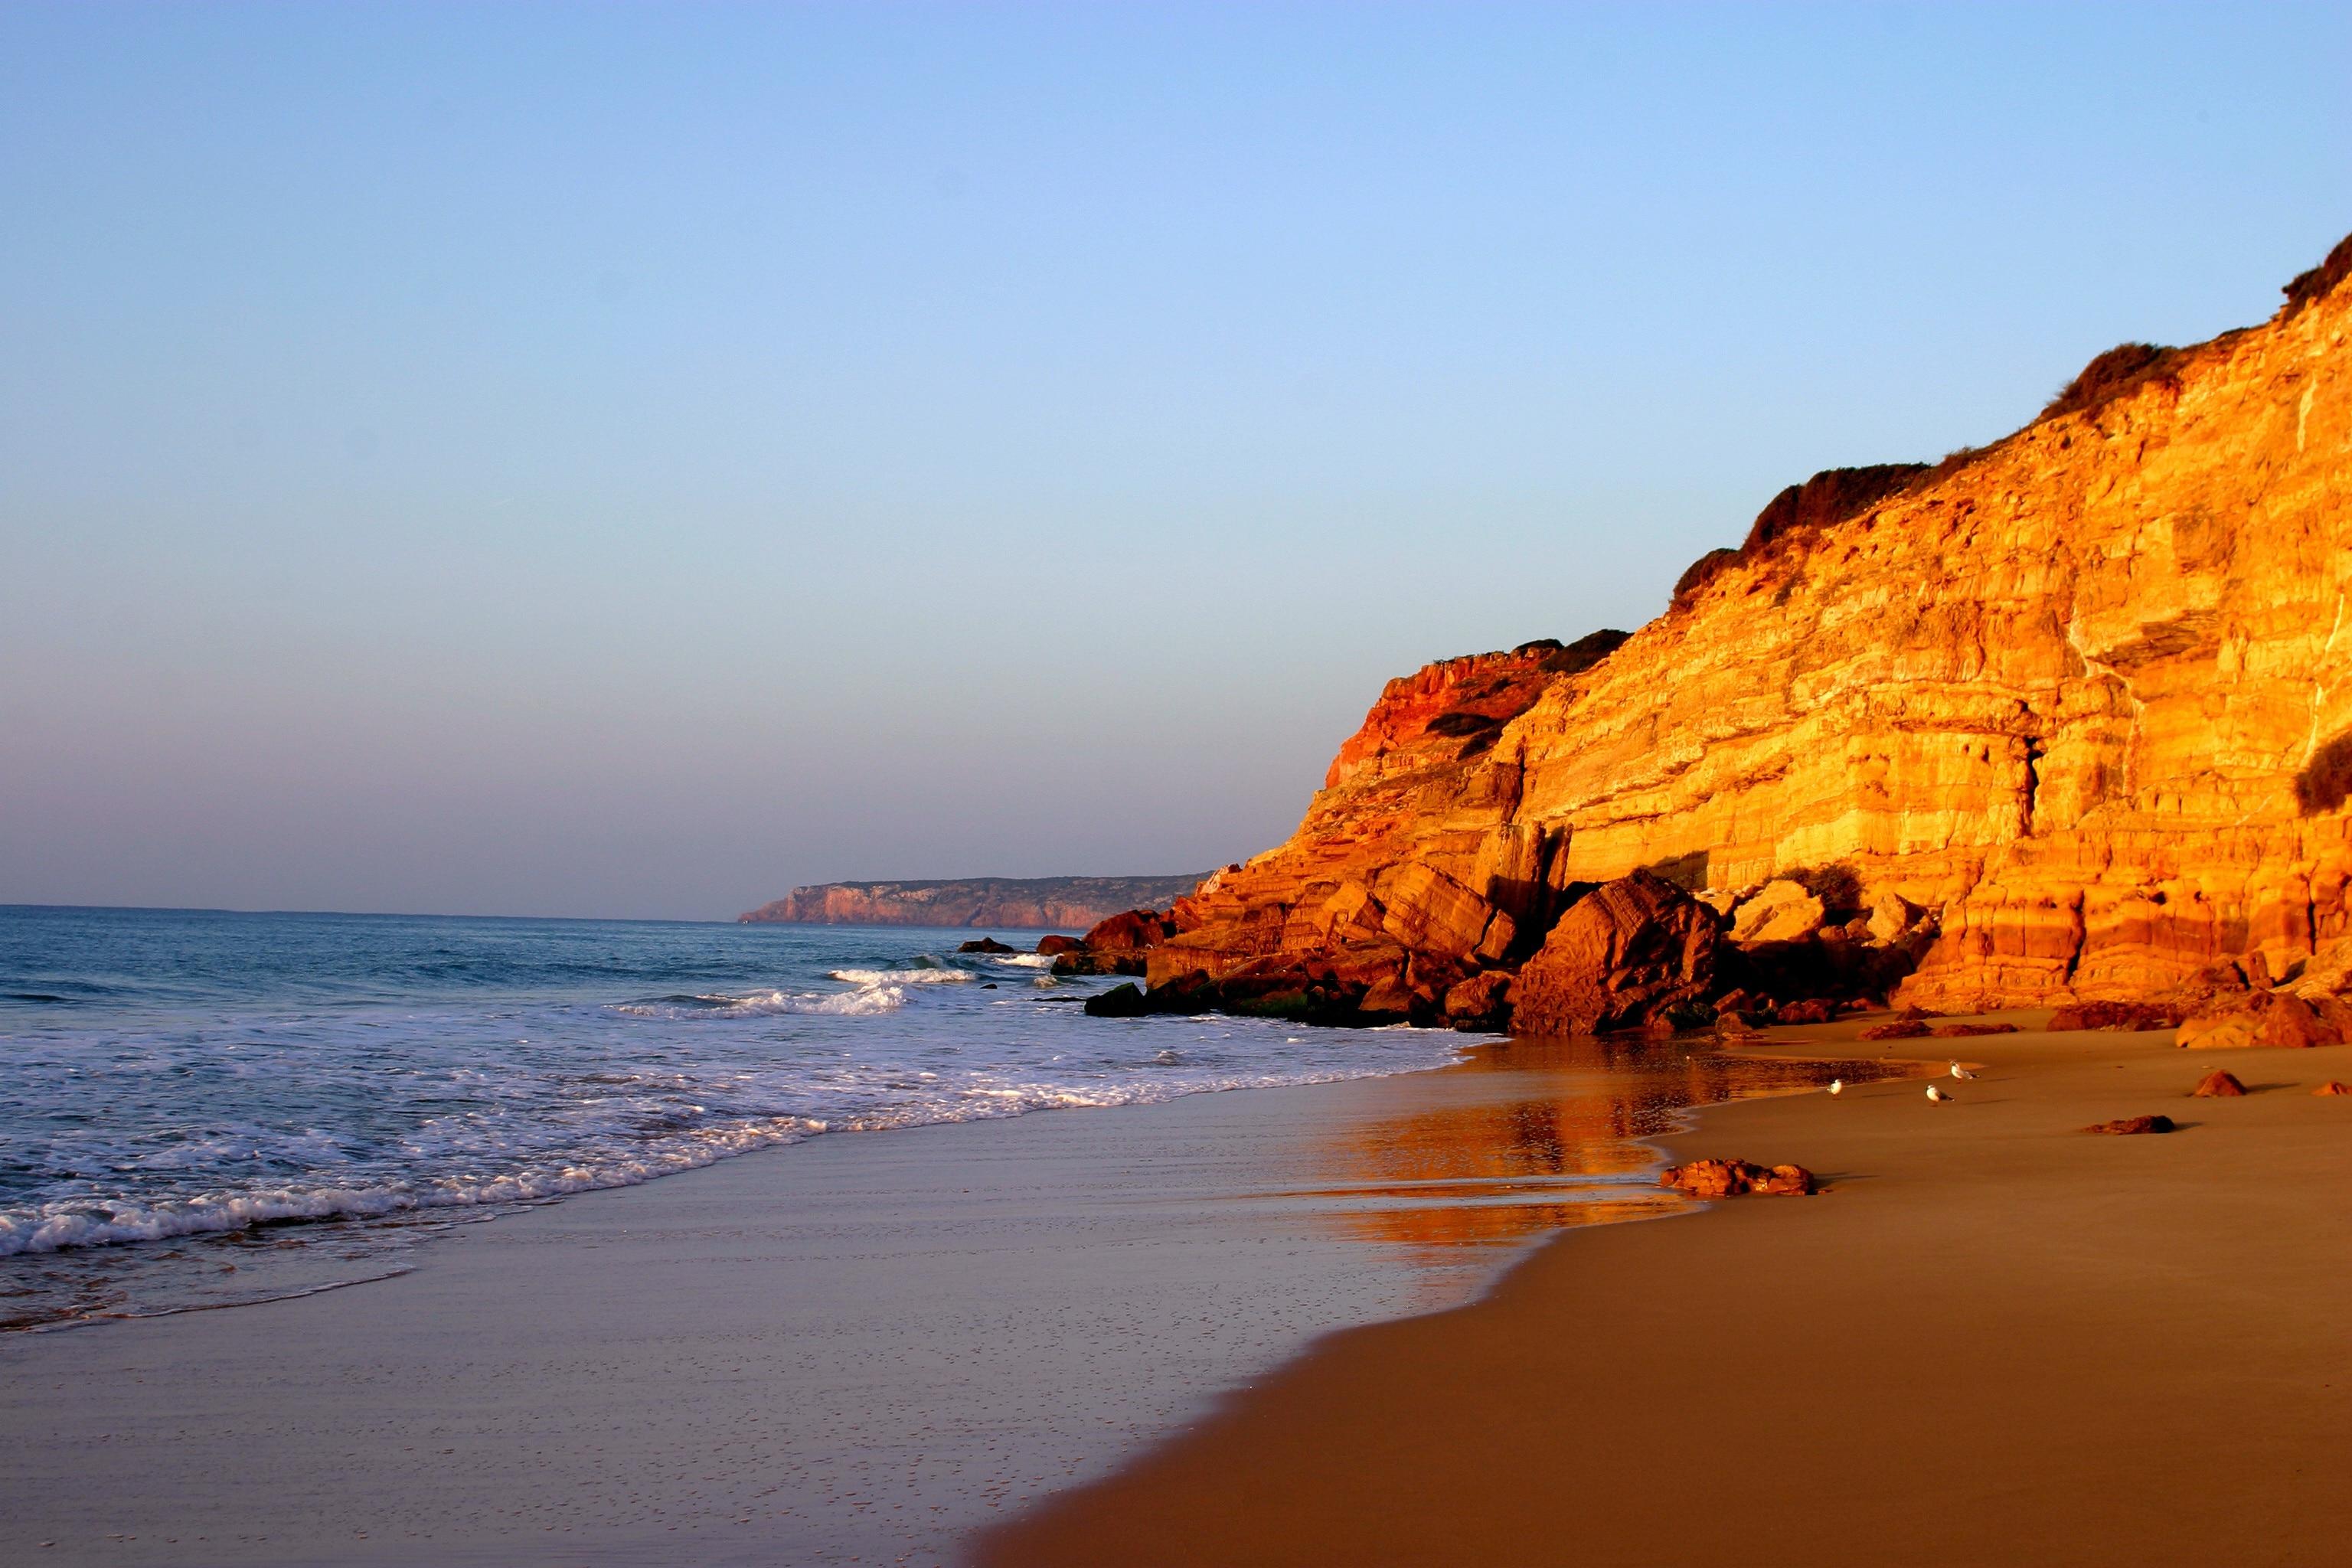 Salema, Vila do Bispo, Distrito de Faro, Portugal